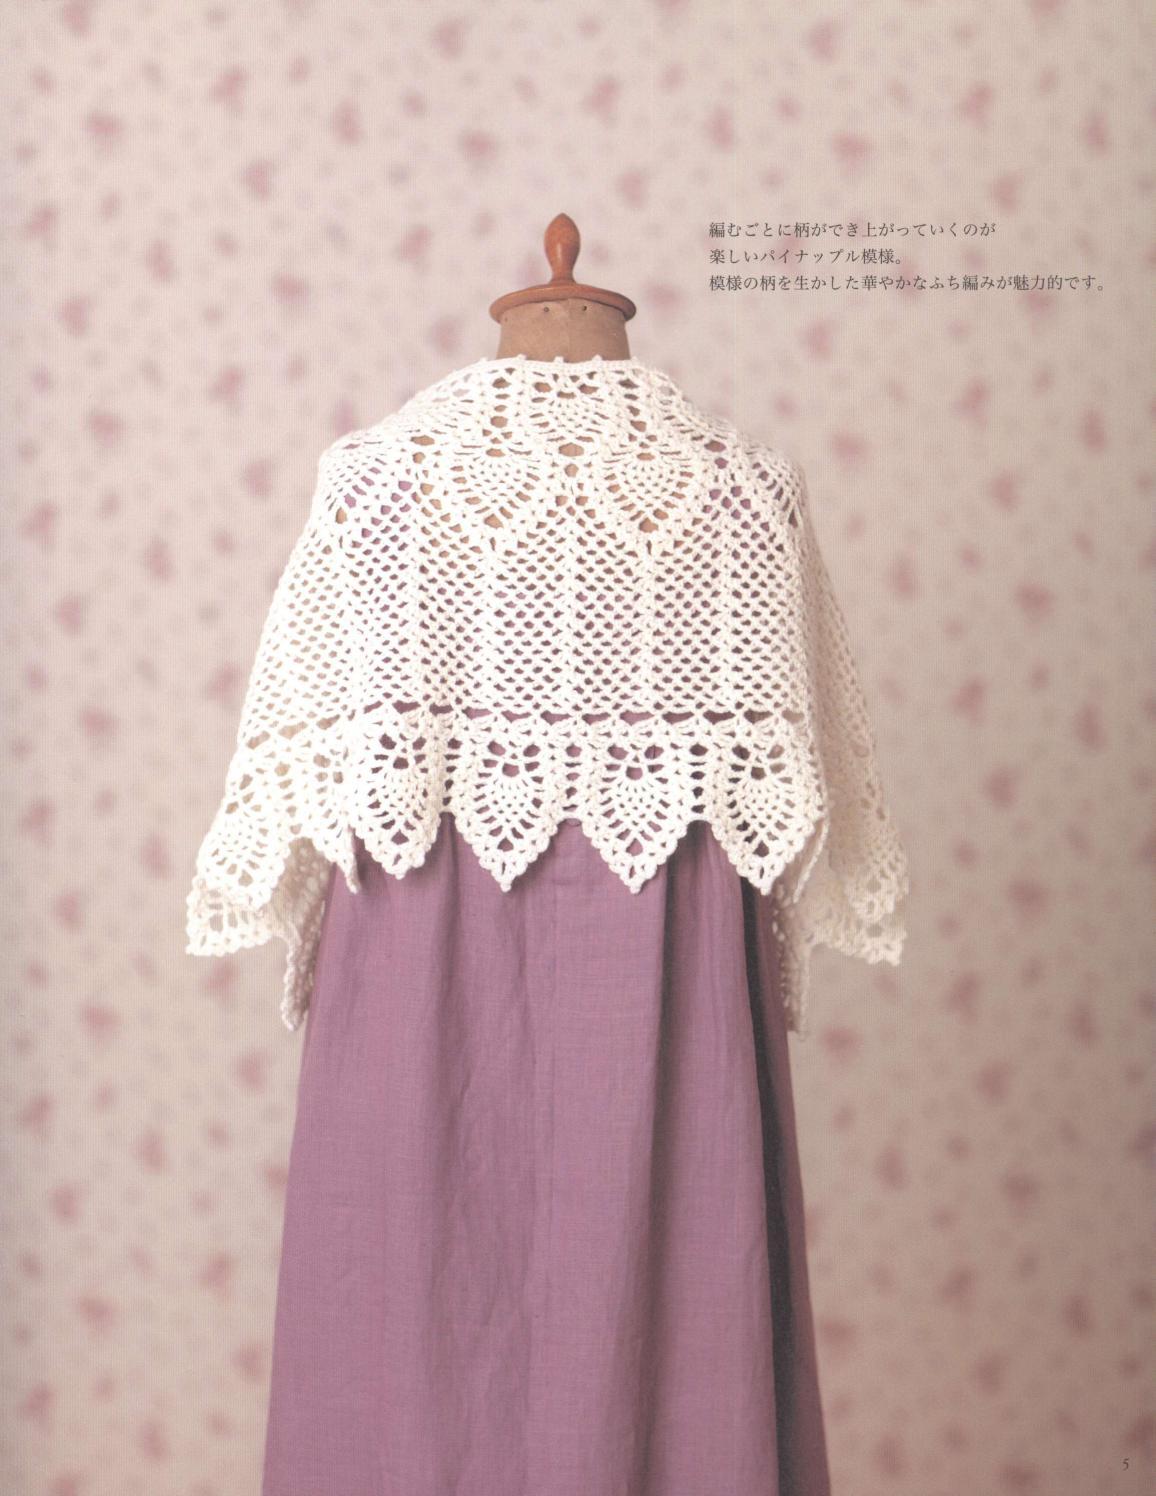 Asahi original crochet best selection 2012 page 5